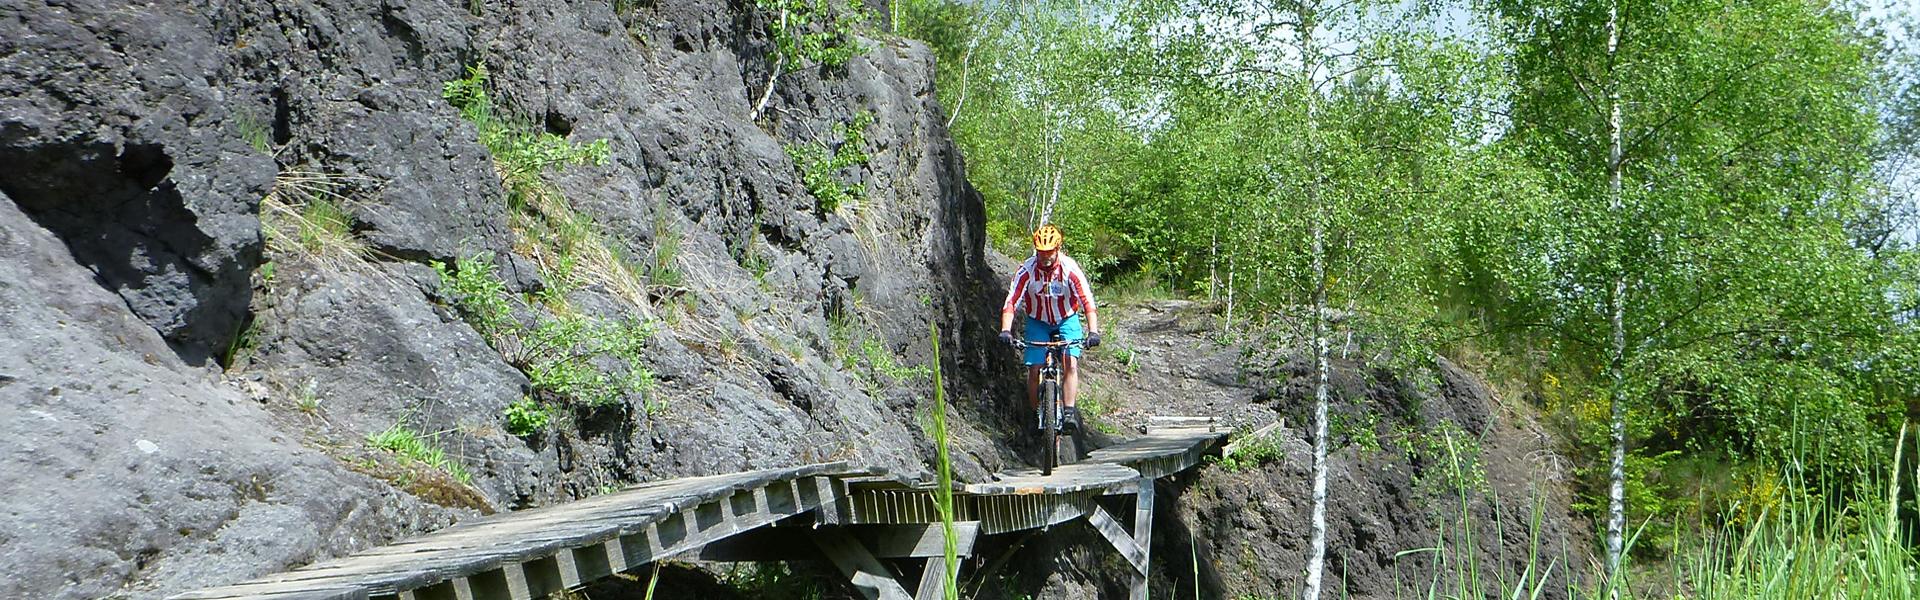 Mountainbike Fahrtechnik Level 3